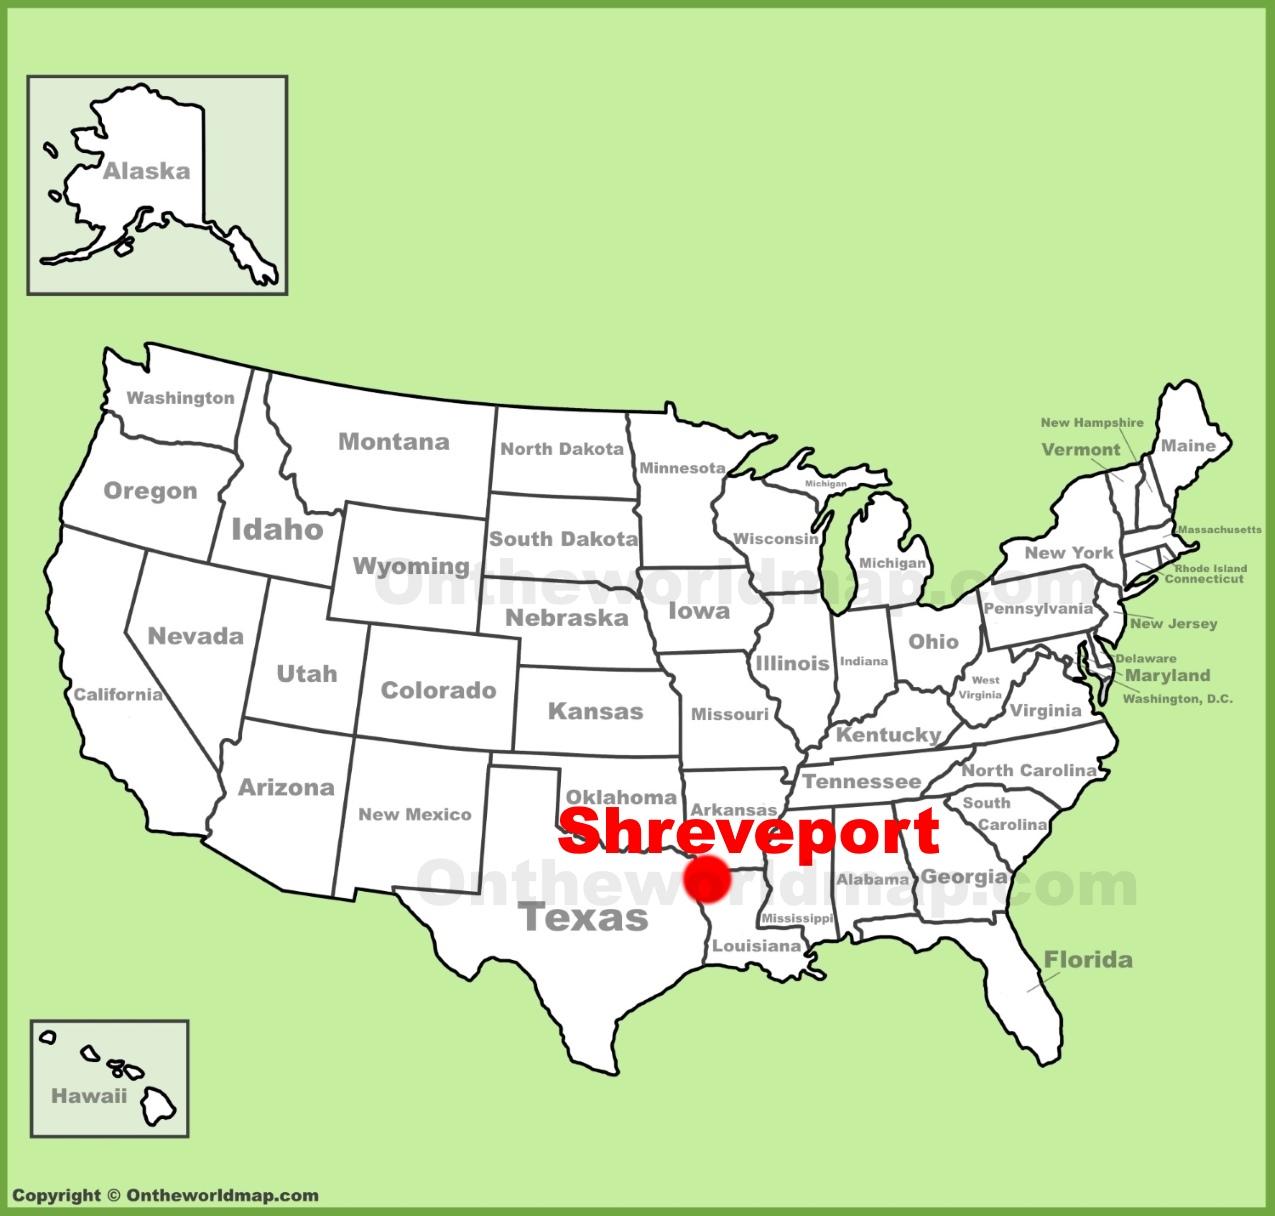 Shreveport location on the US Map